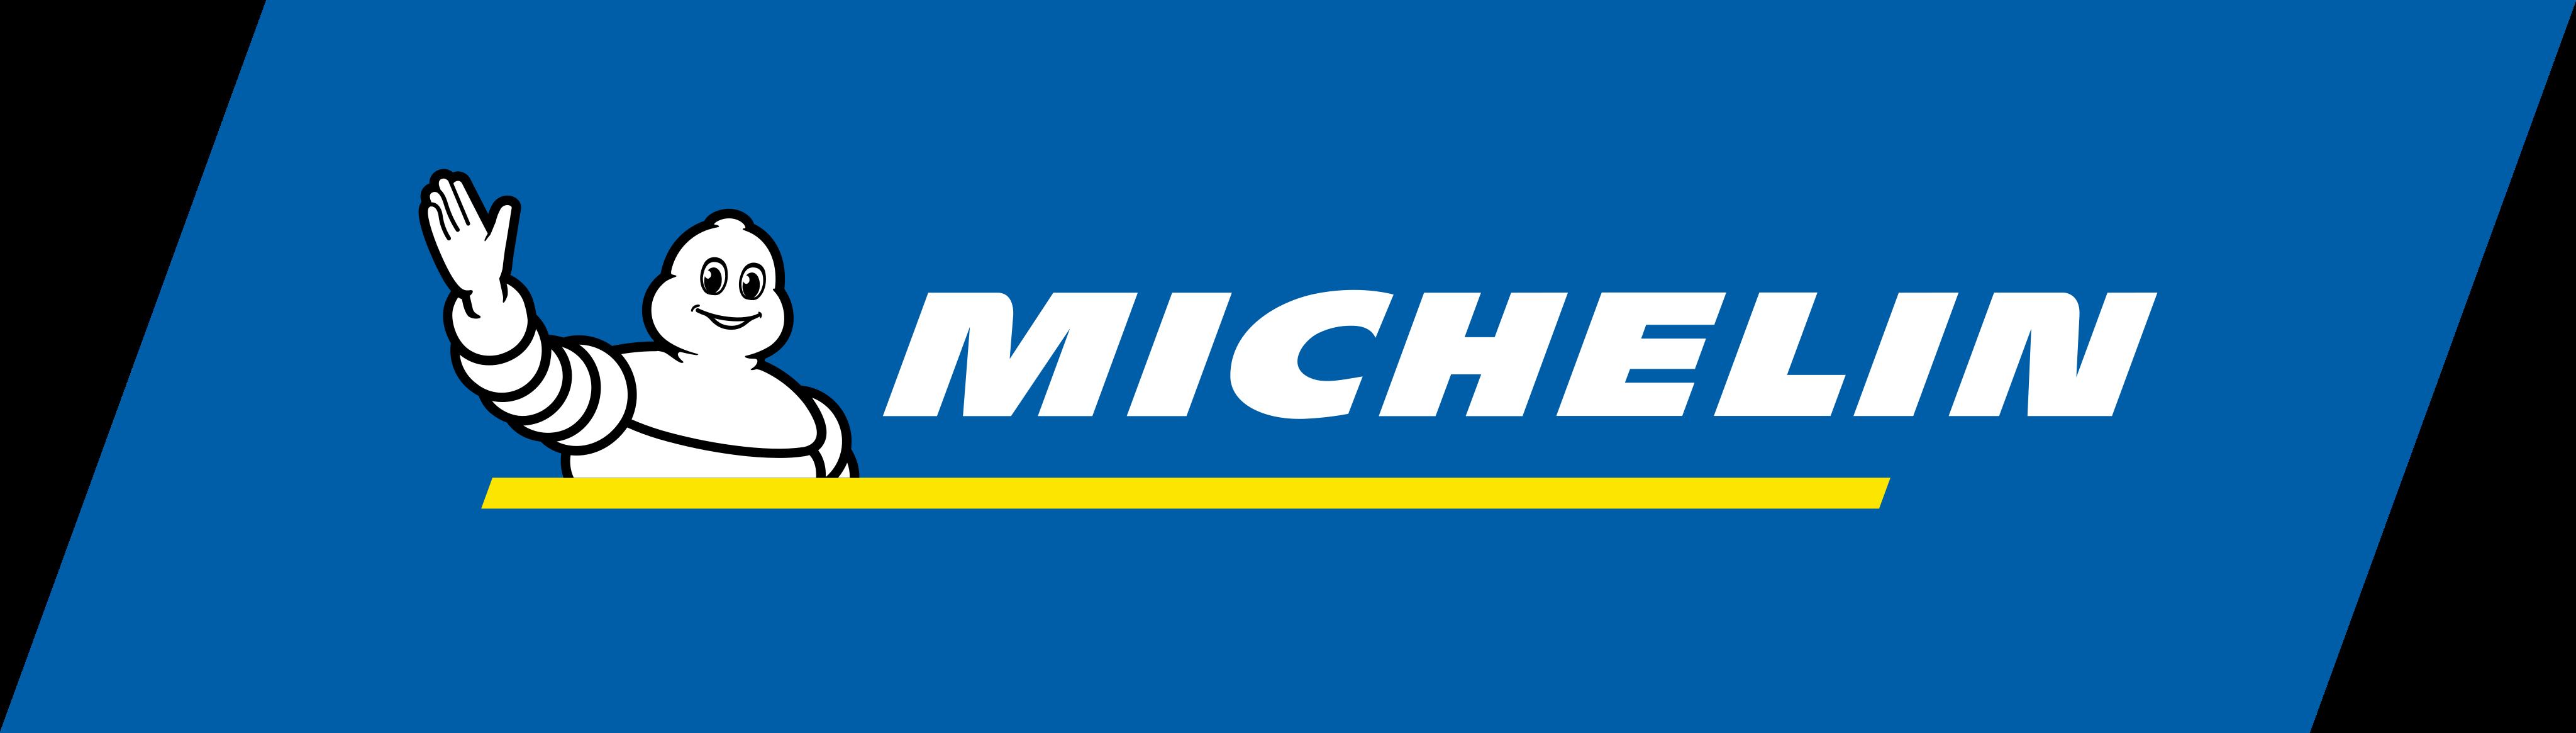 michelin logo 6 - Michelin Logo